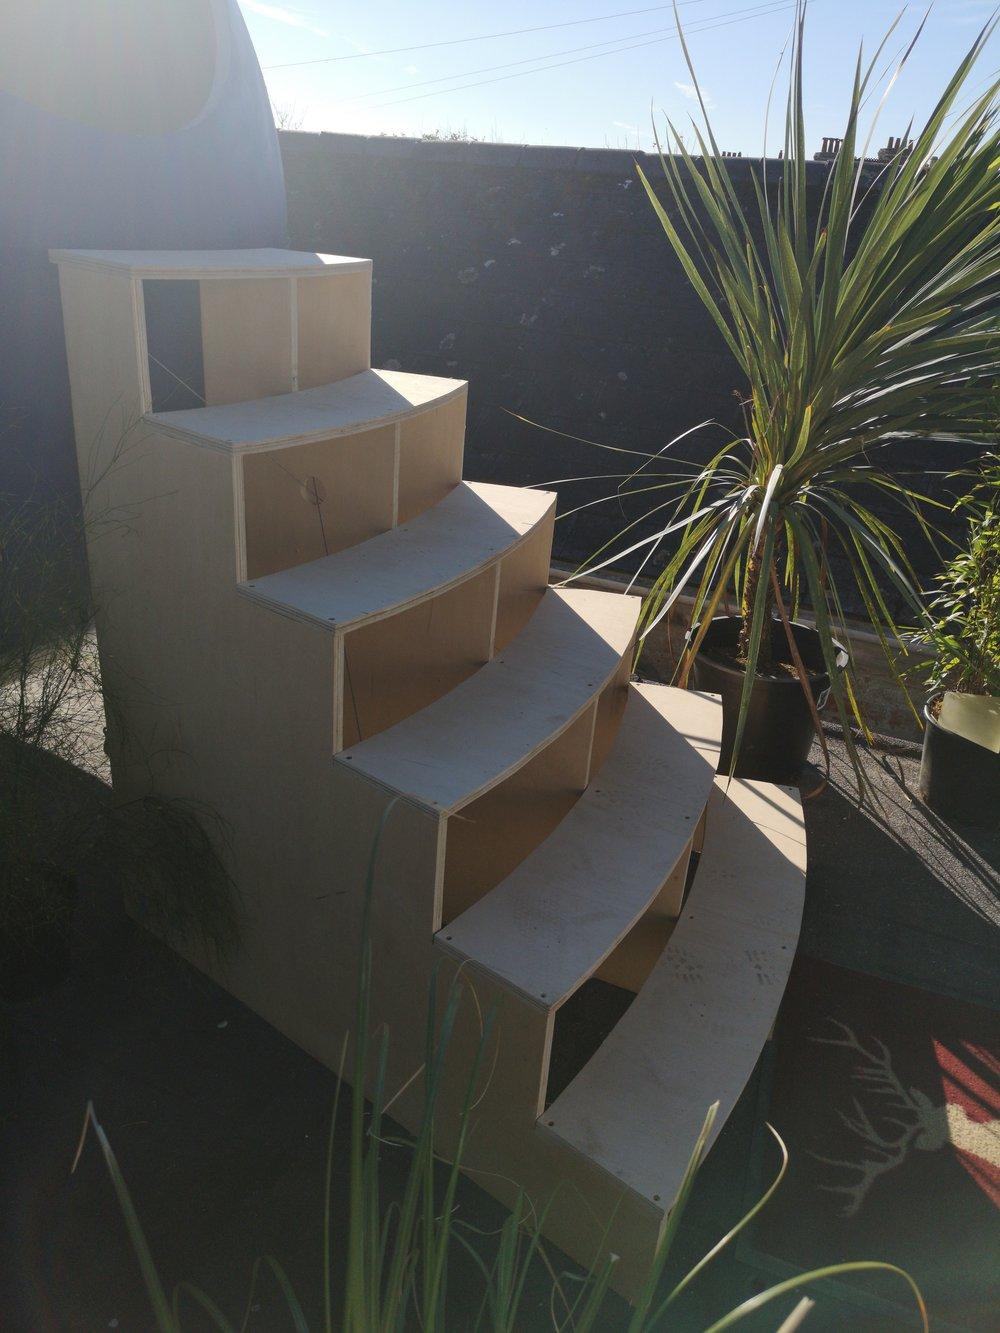 Plywood steps